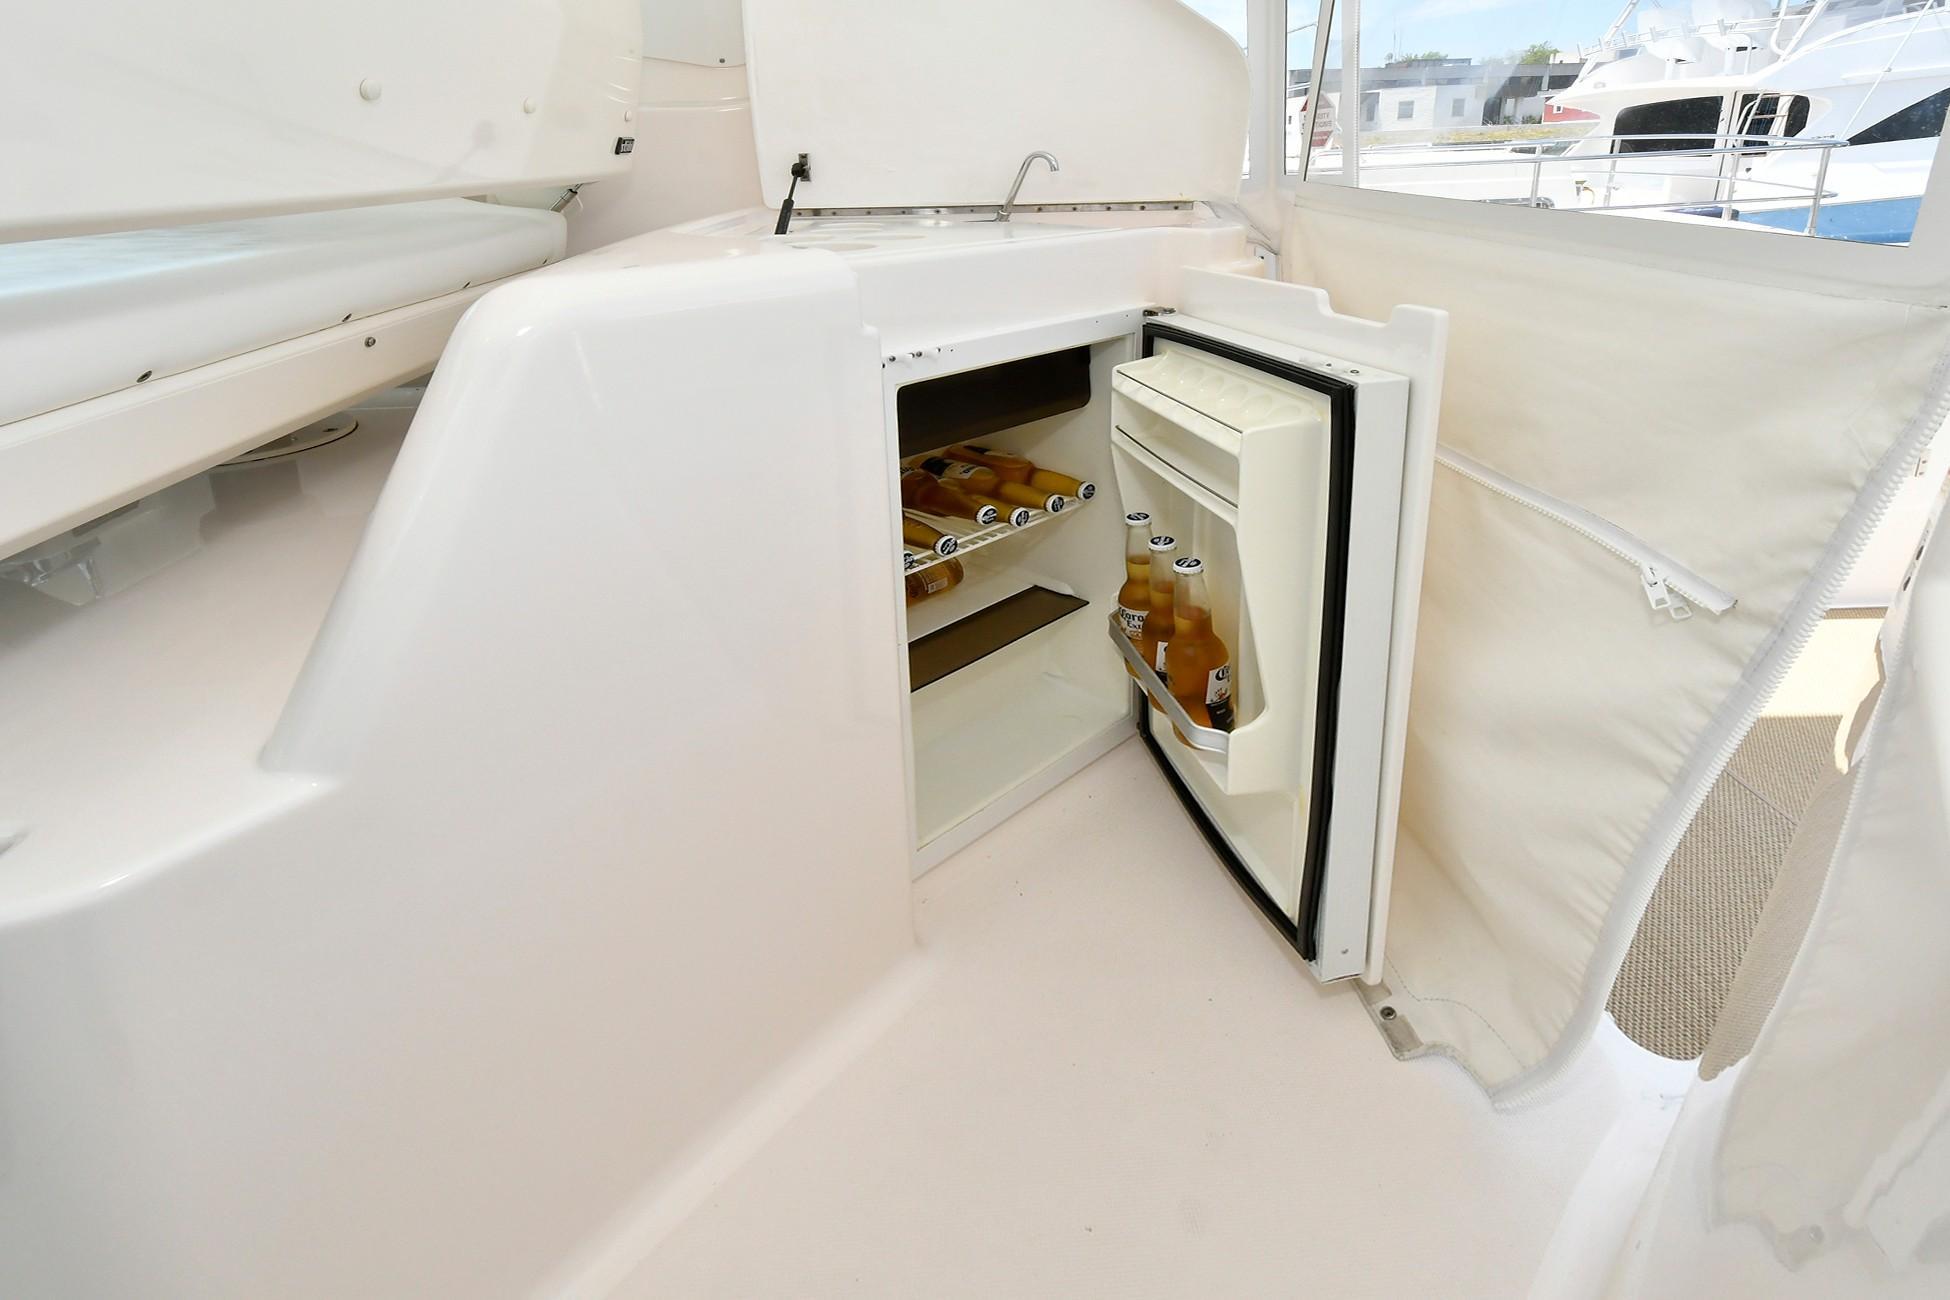 Cockpit Wet Bar with Refrigerator